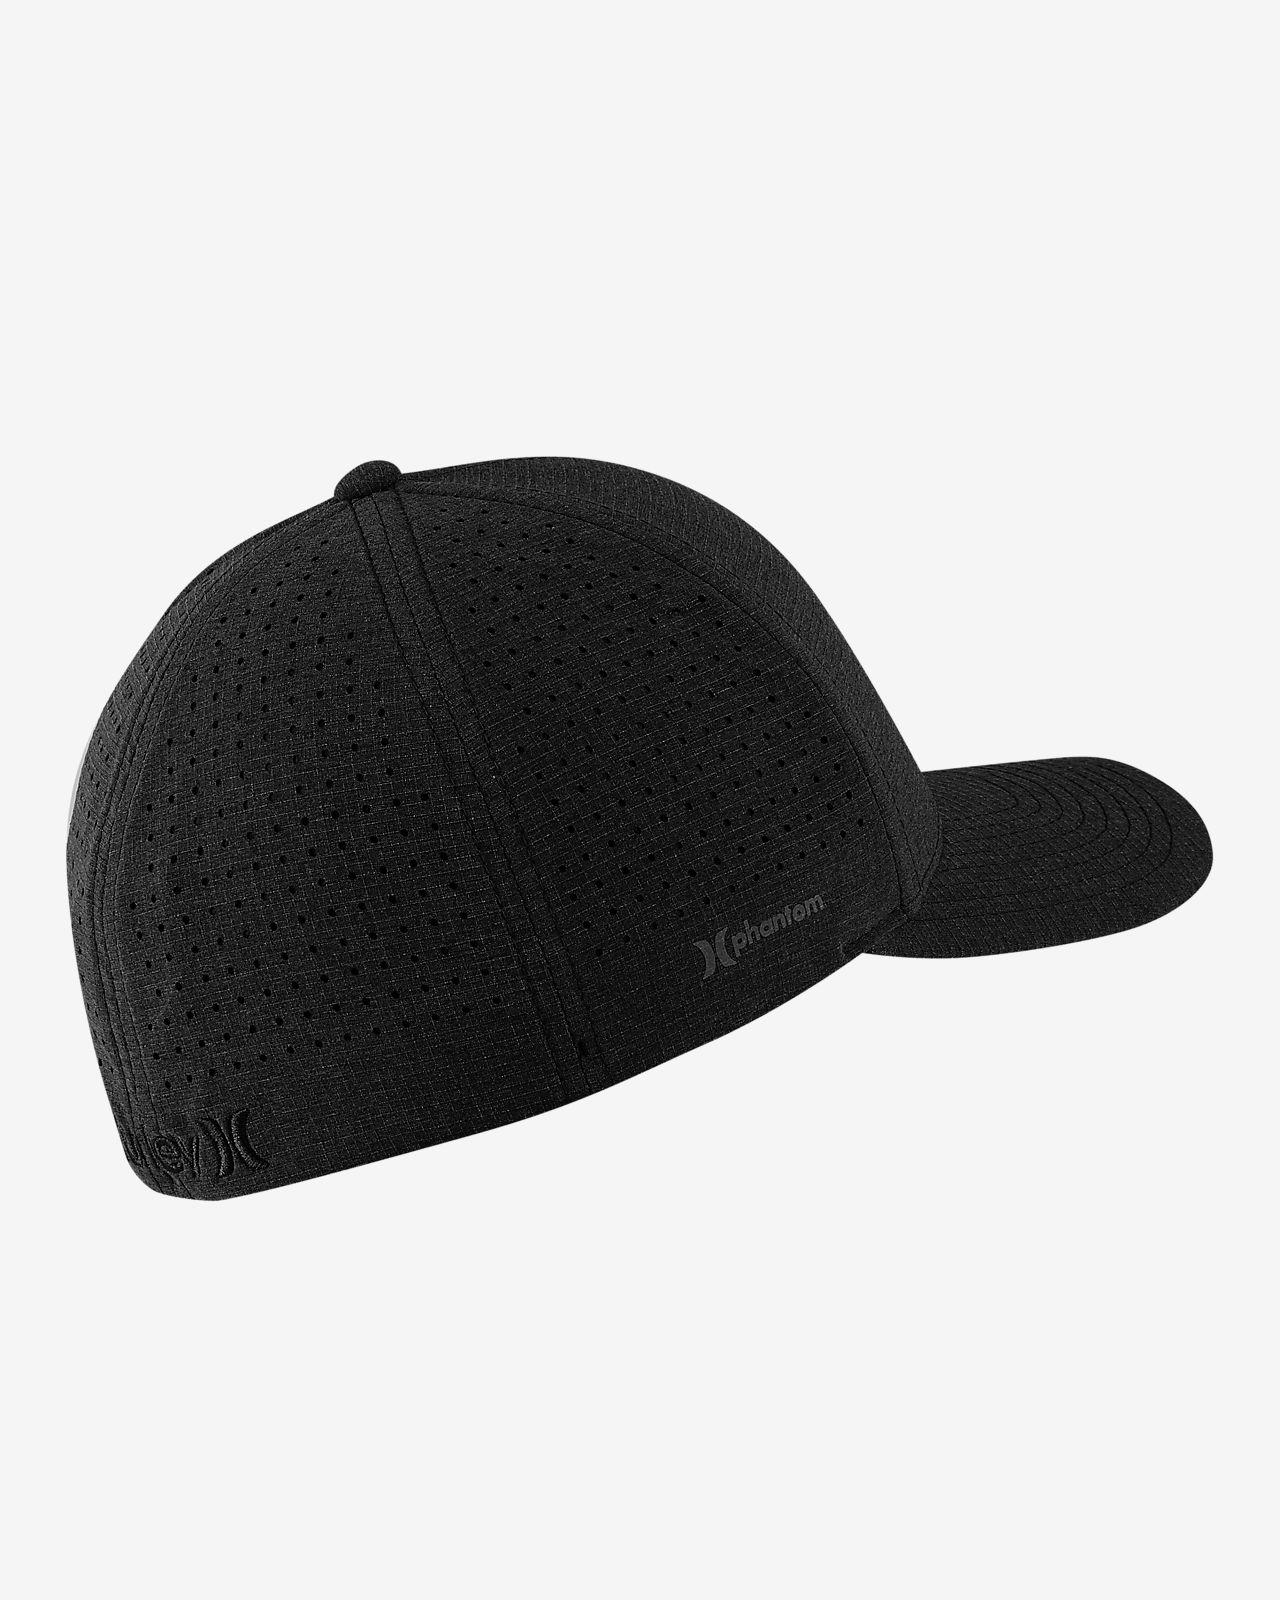 e67c967c Hurley Phantom Men's Ripstop Hat